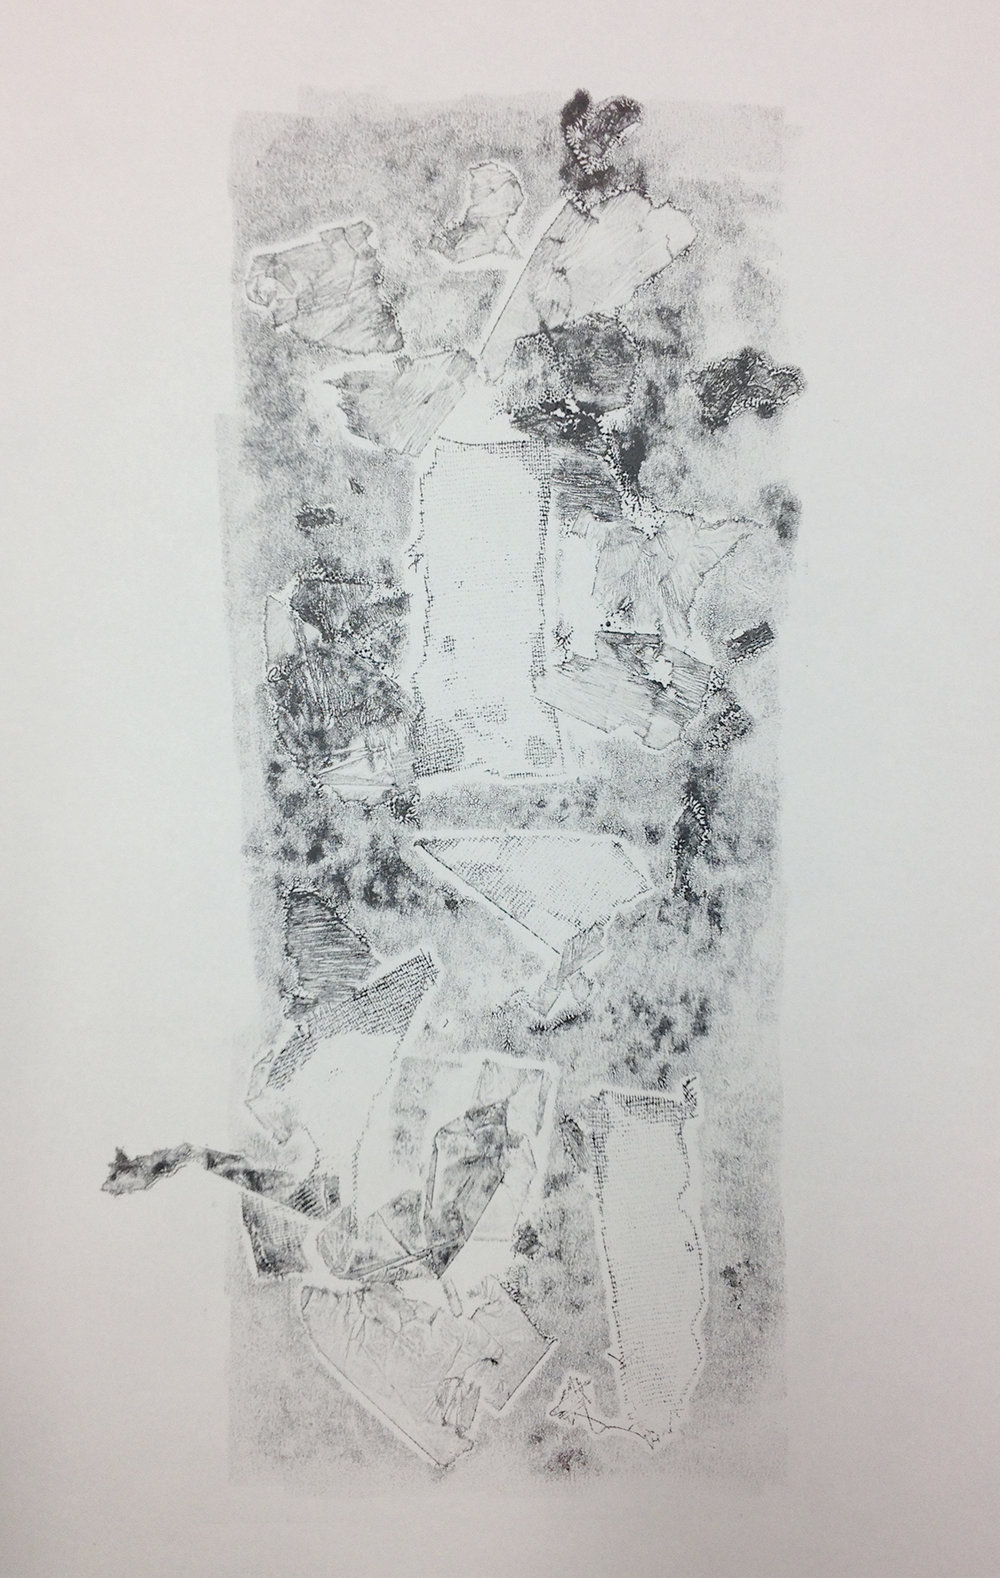 Imprinting Textures Series, (2017) Inked newsprint print (A3)